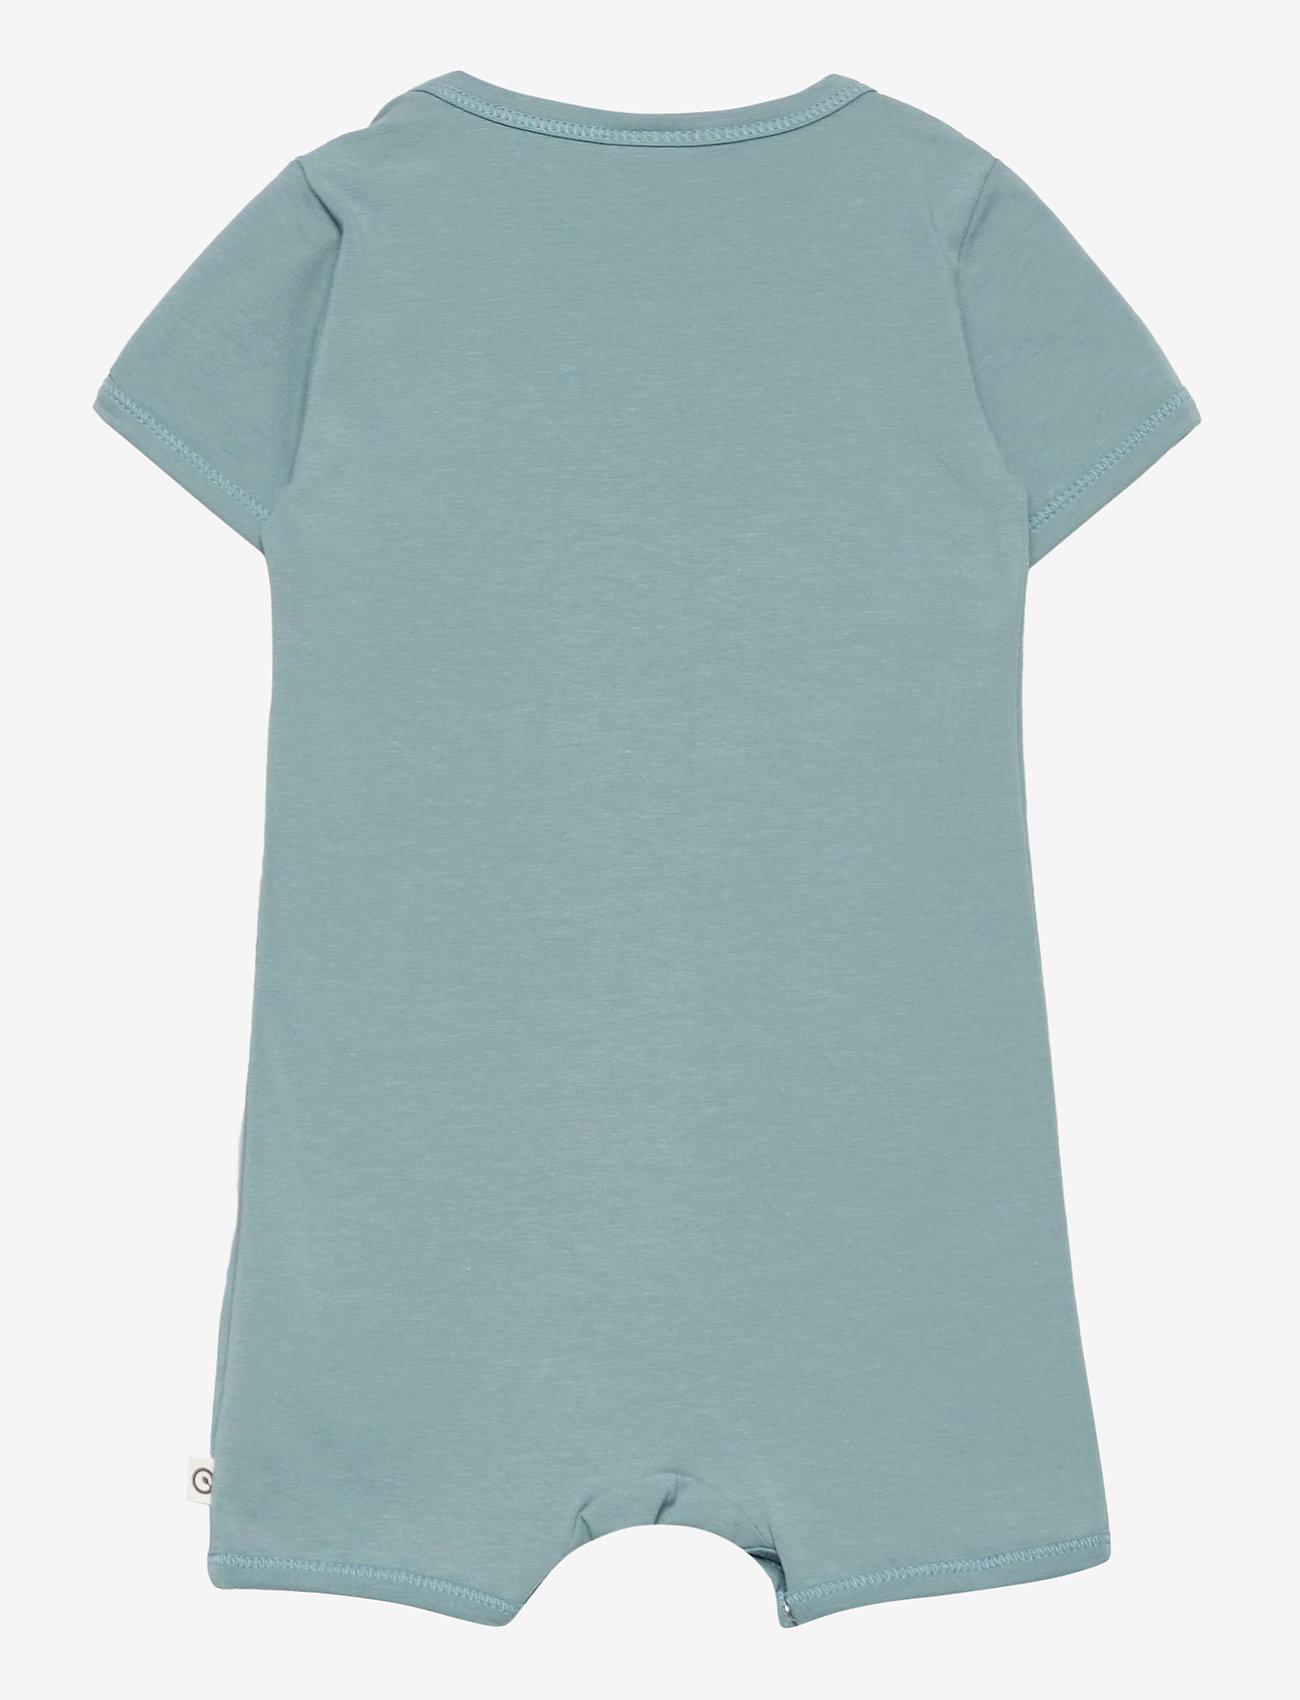 Müsli by Green Cotton - Cozy me beach body - kurzärmelig - forever blue - 1